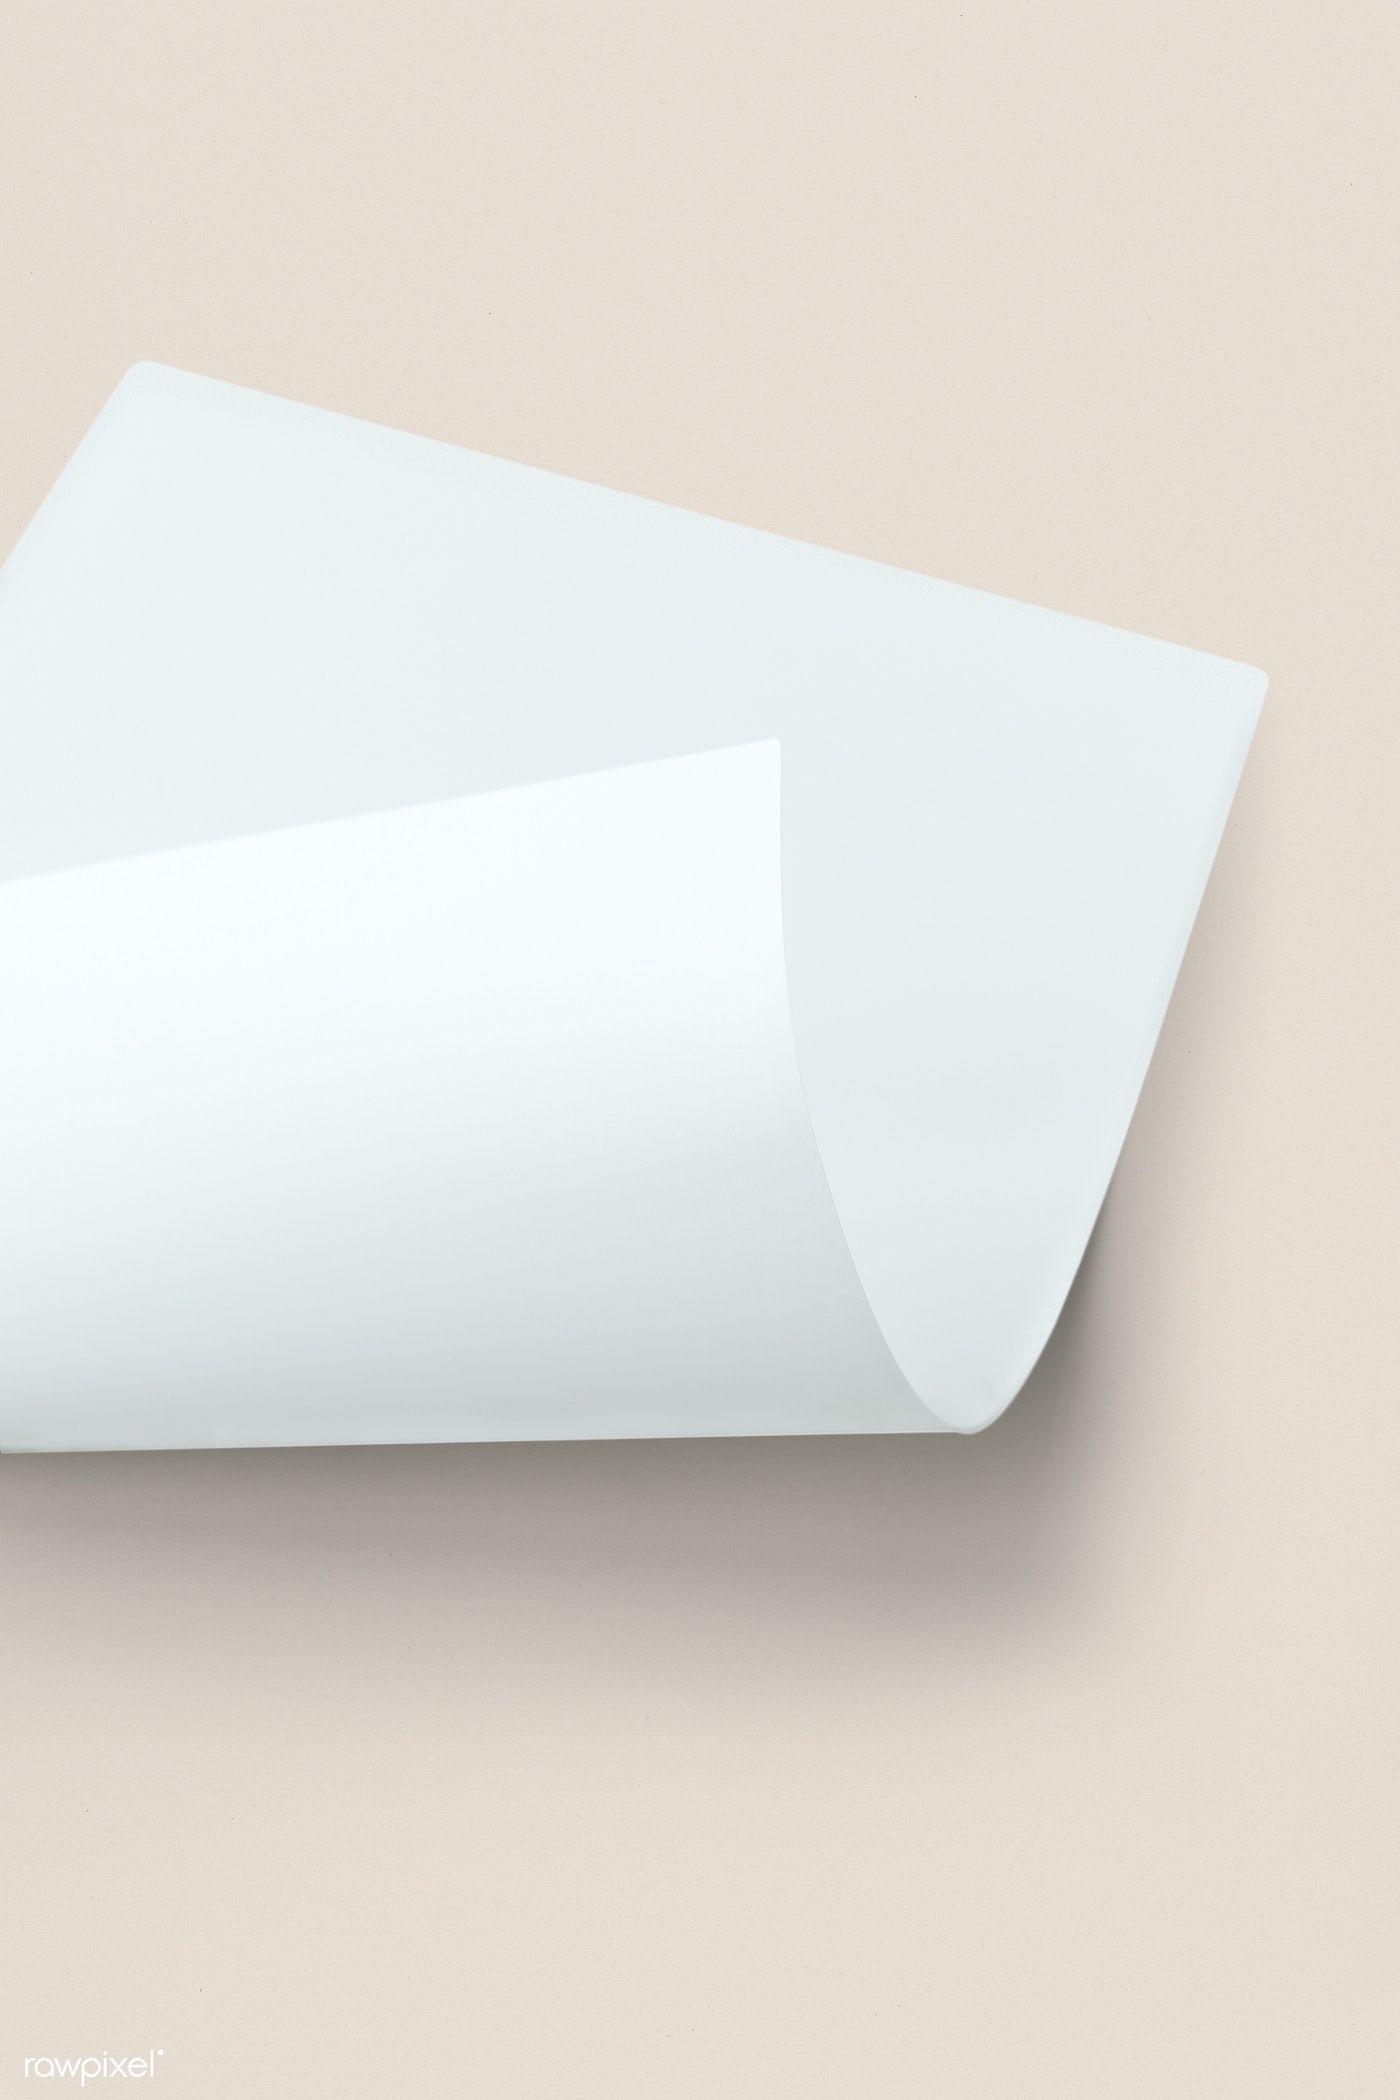 Blank White Folded Paper Mockup On A Beige Background Free Image By Rawpixel Com Ake Beige Background Paper Mockup Backdrops Backgrounds